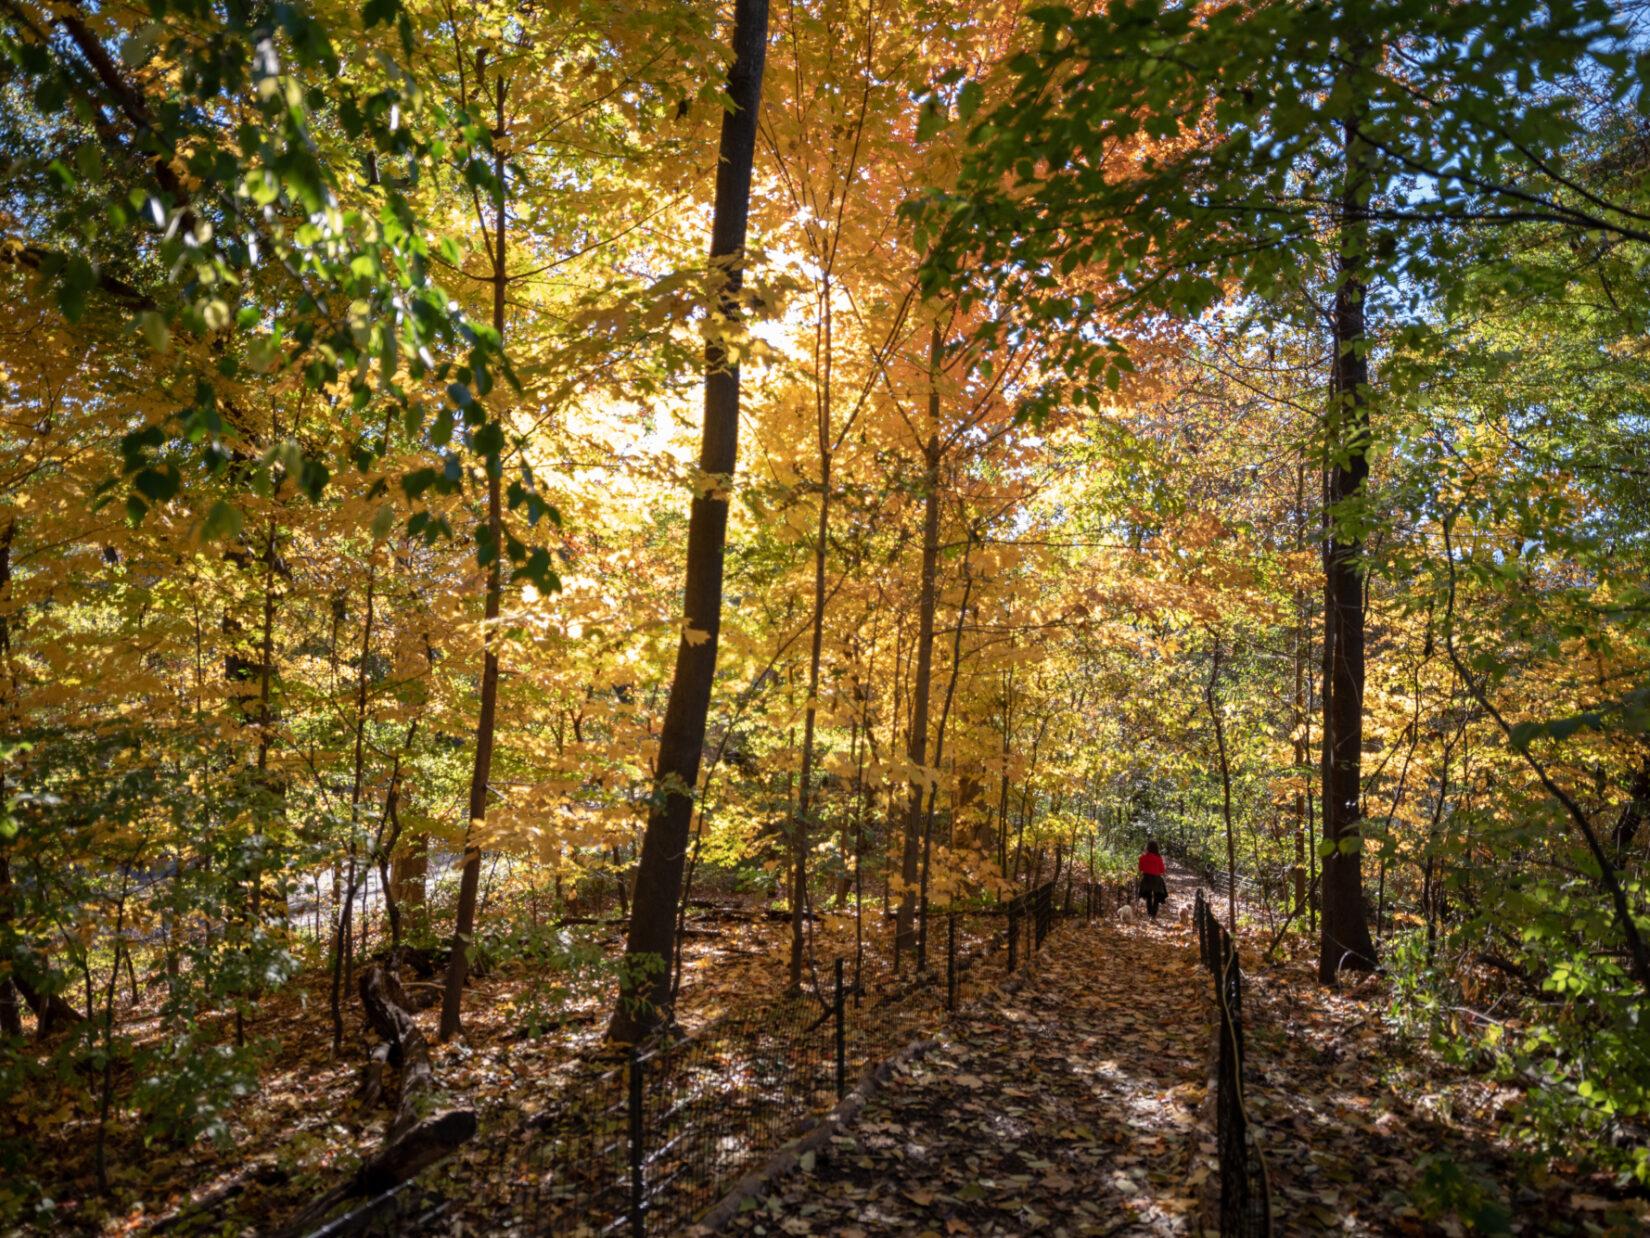 Schenck Central Park Ramble 2018 11 07 DSC 4589